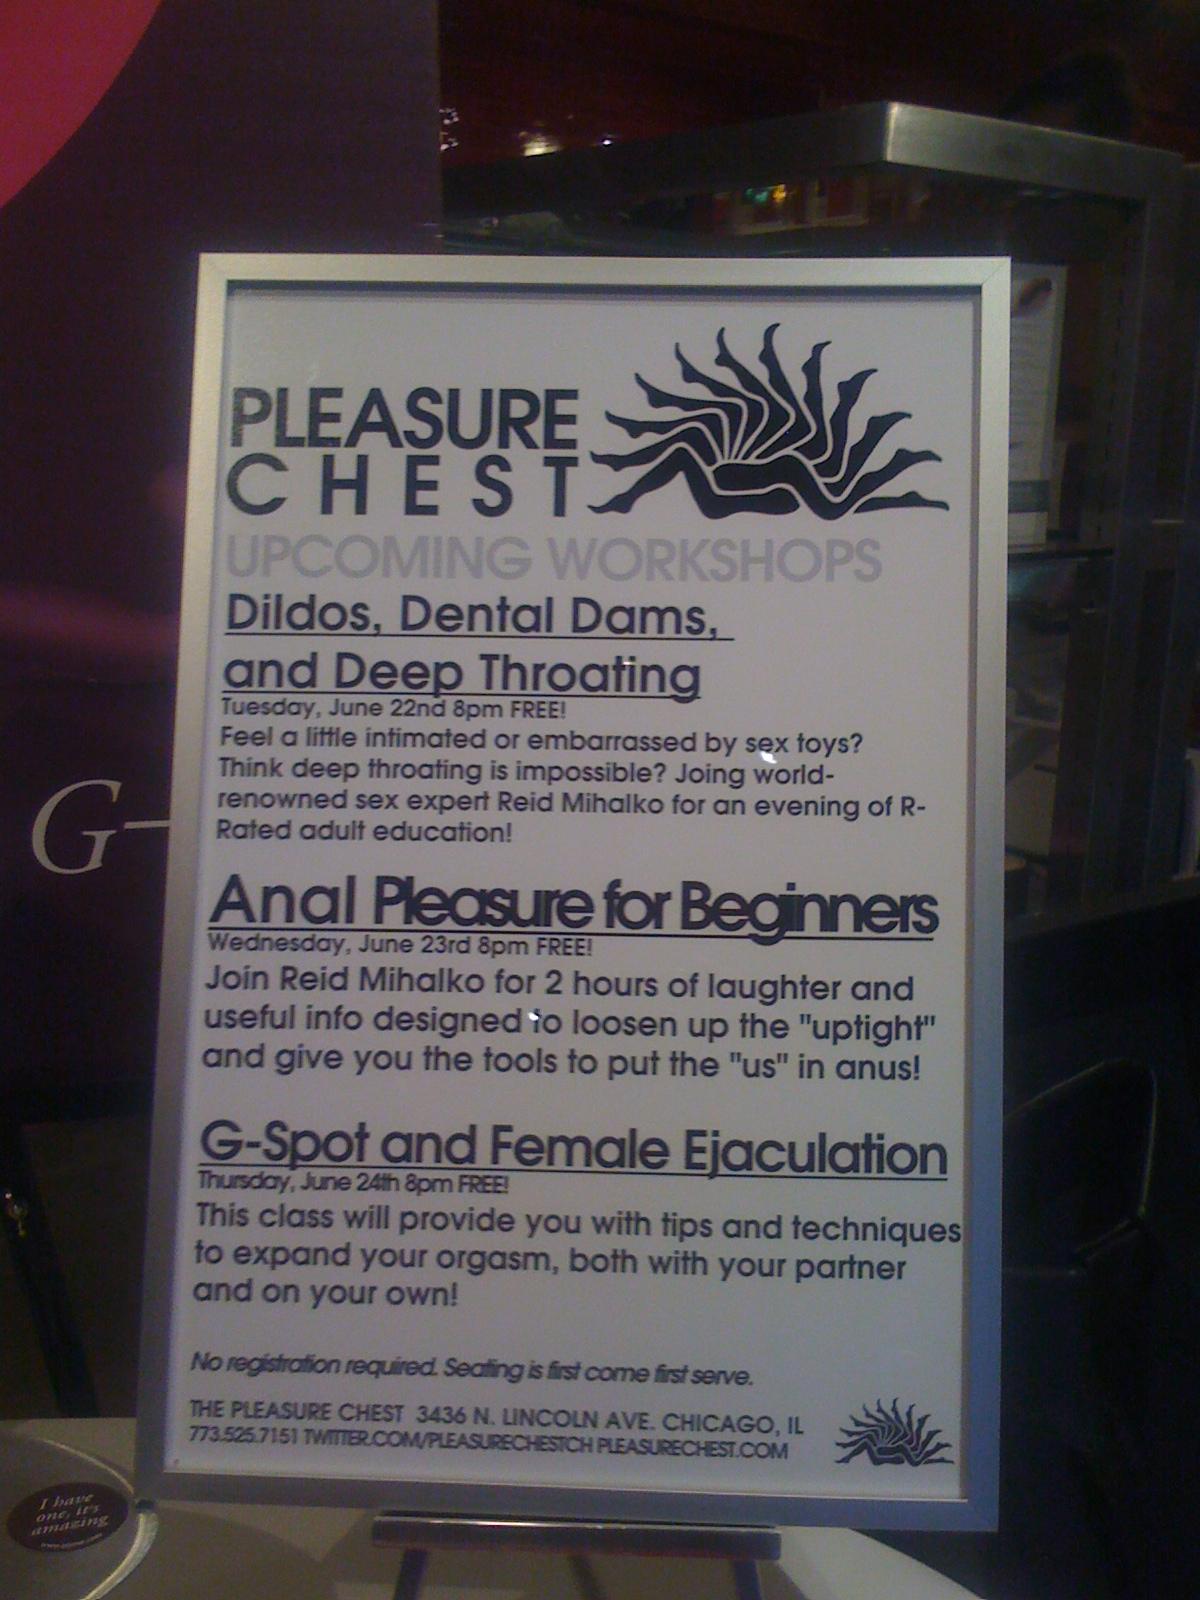 Pleasure Chest CHI sign Ultimate Anal Pleasure, Wonderful Deep Throat BBBJ, Excellent Rate, Richmond